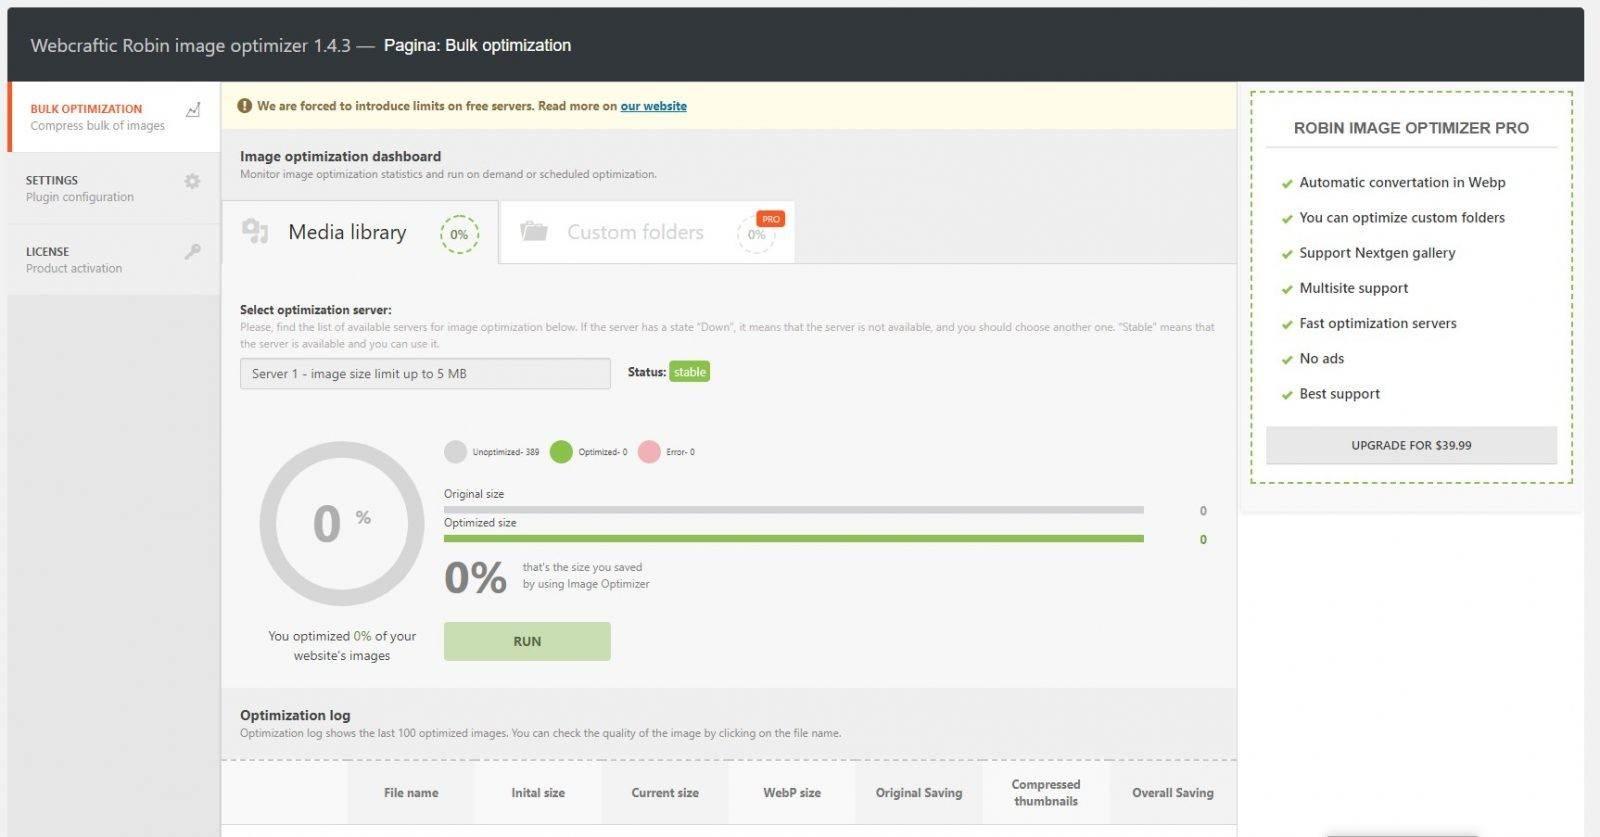 robin image optimizer overview